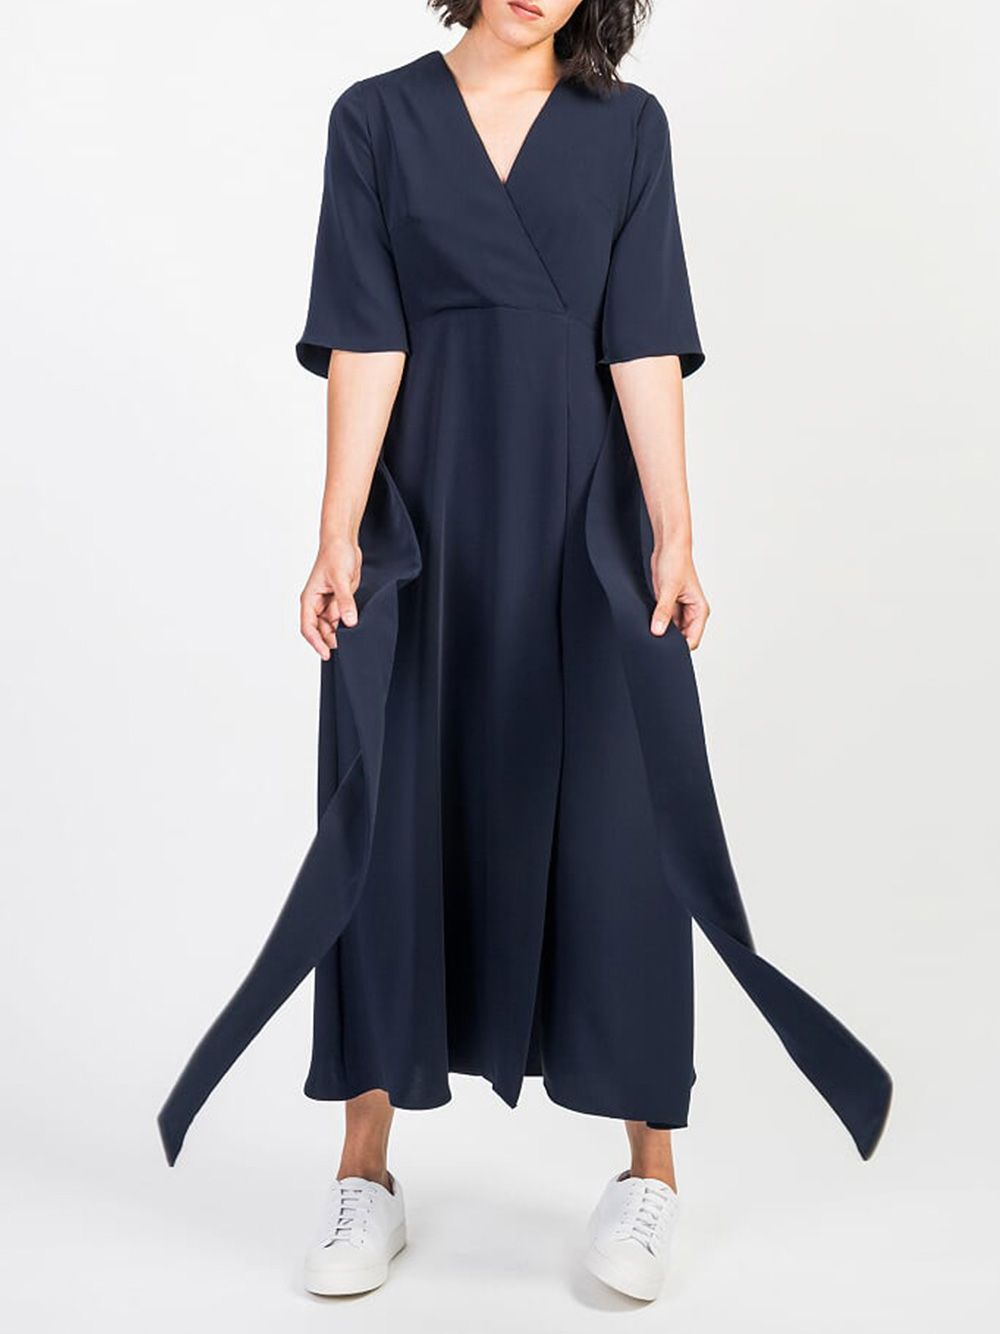 Vestido Midi Alya | Hyena Tailor Made